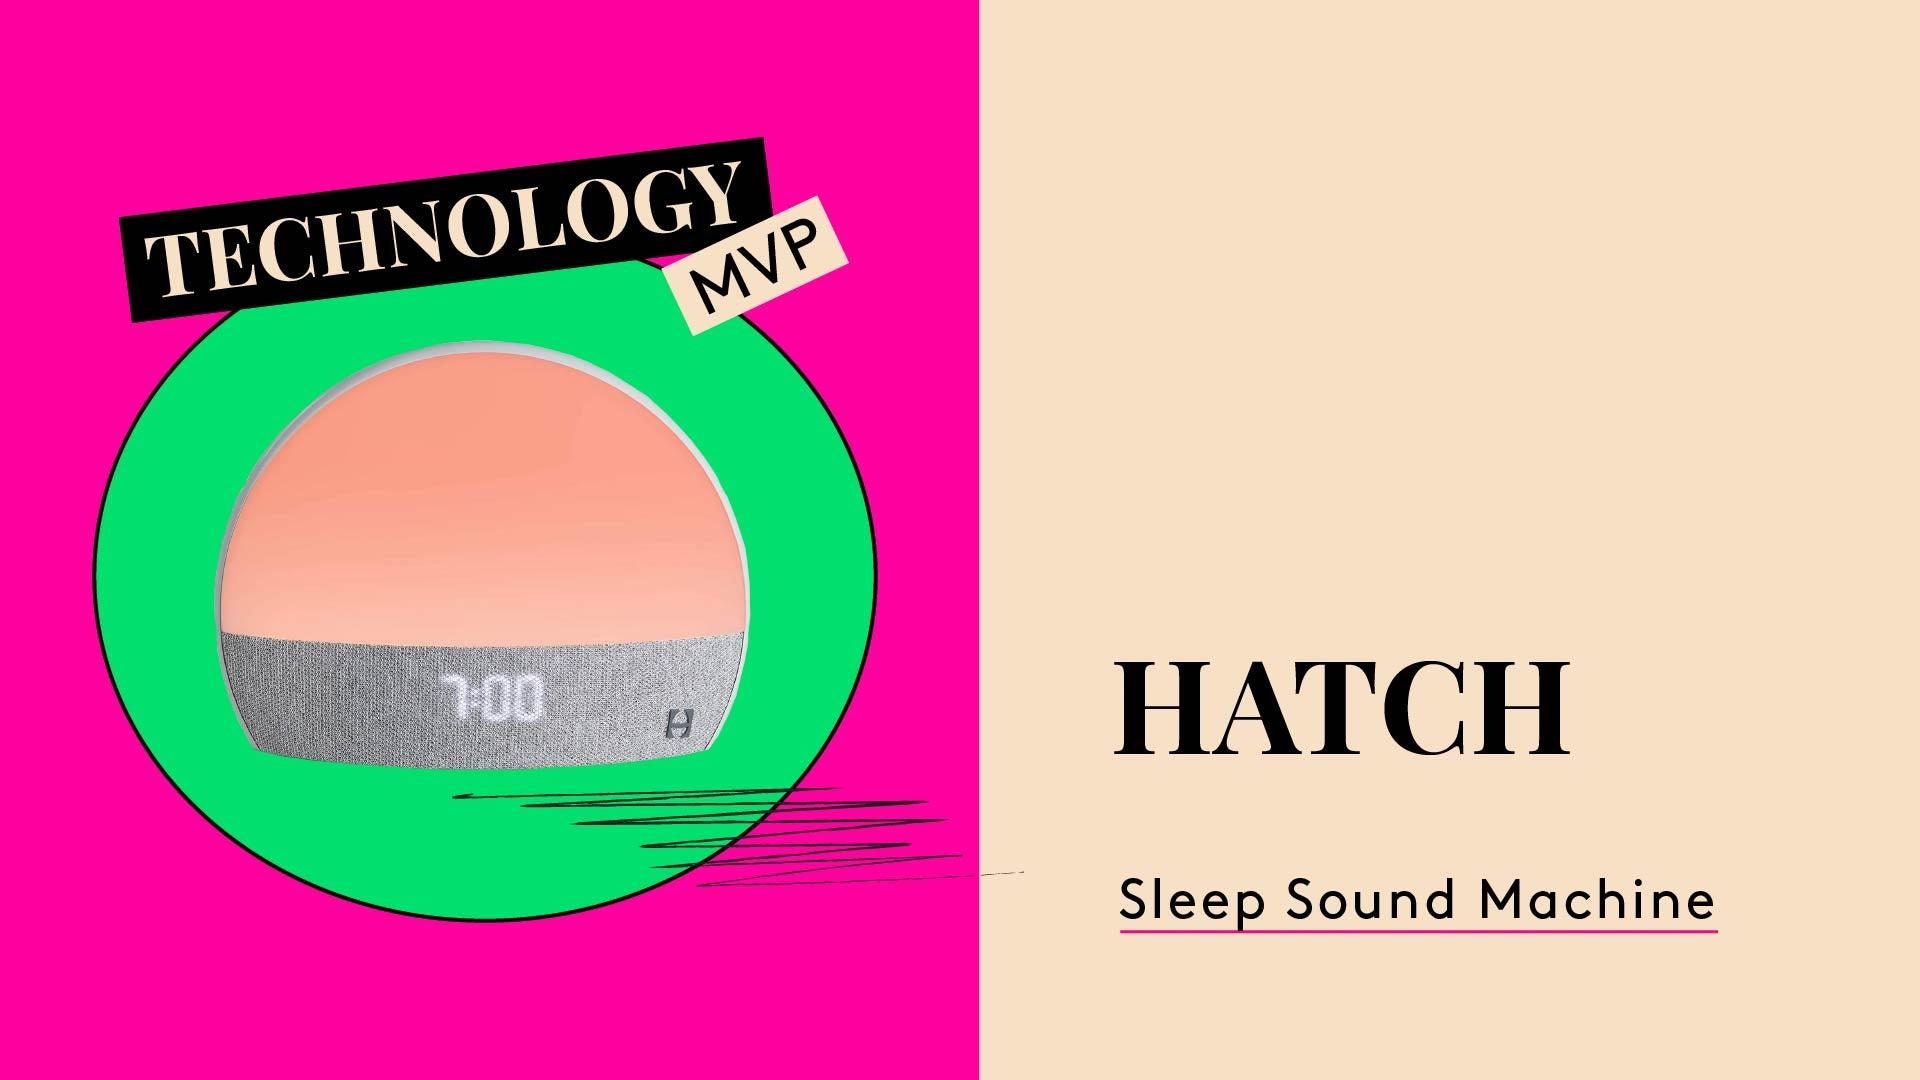 Technology MVP. This is a photo of Hatch Restore sleep machine.